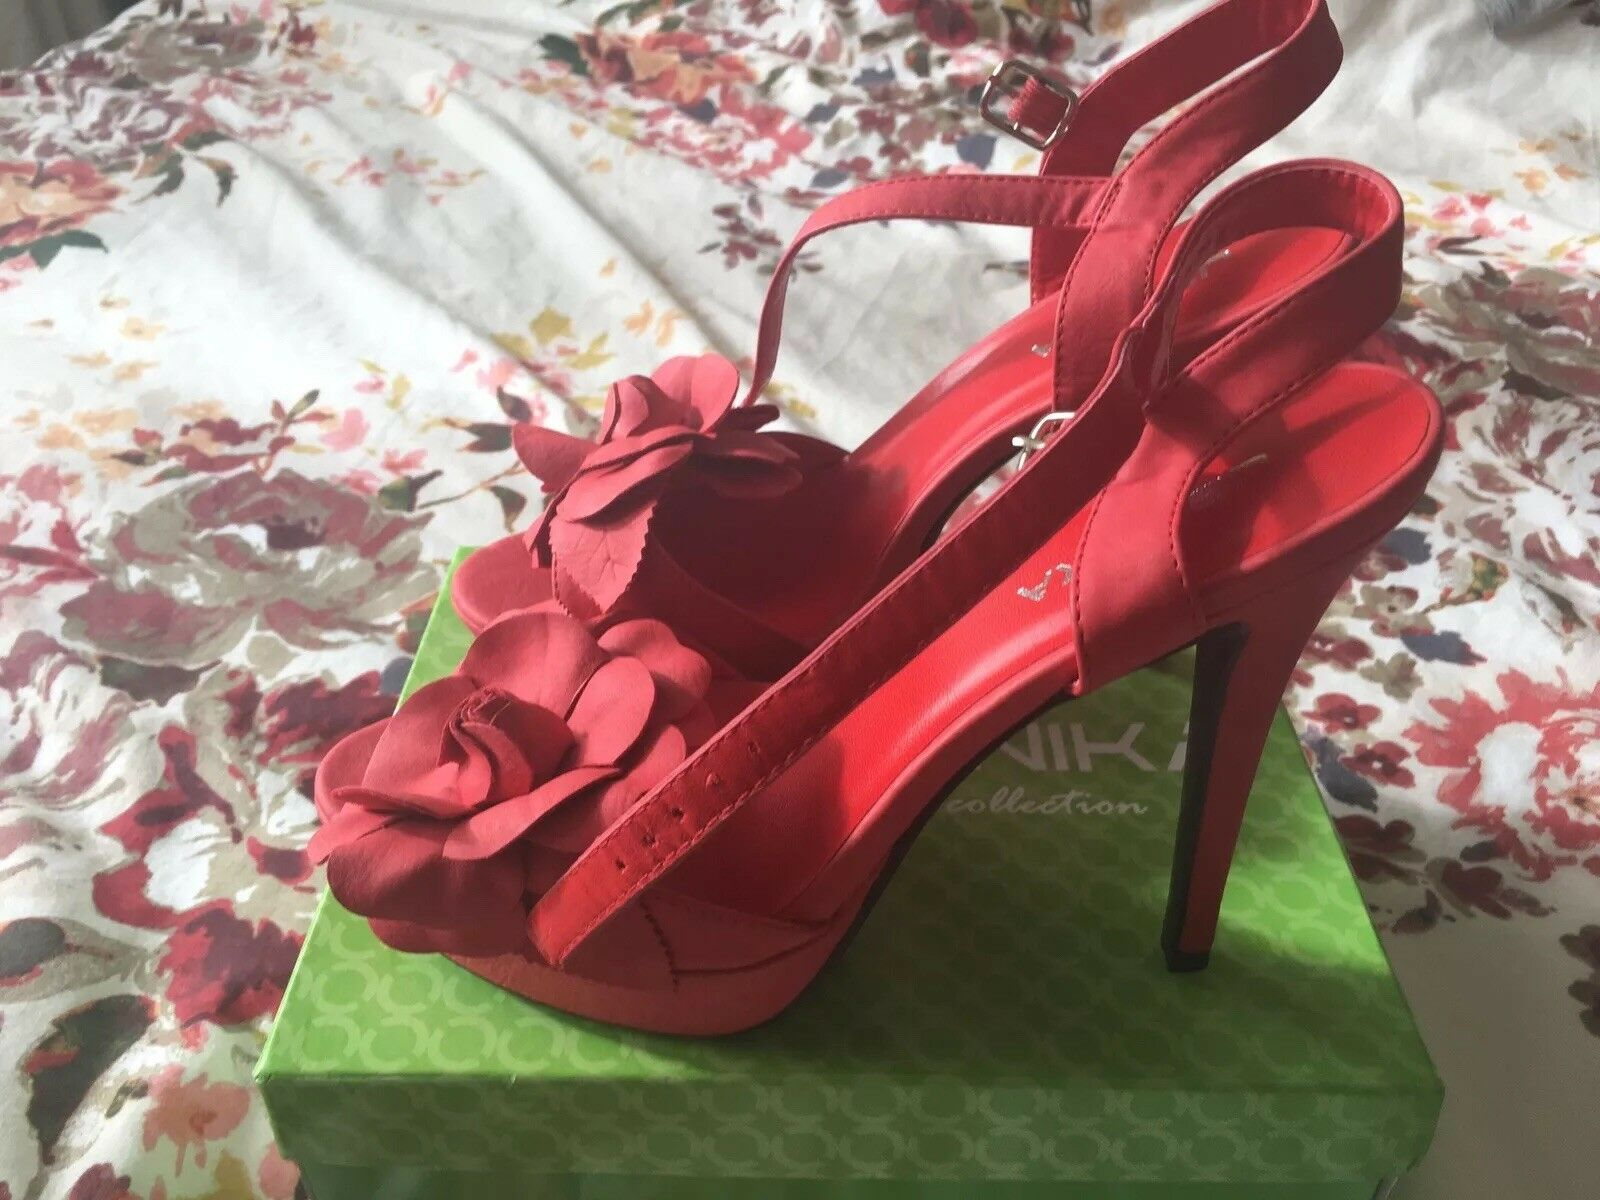 woman shoes size 5 Euro 38